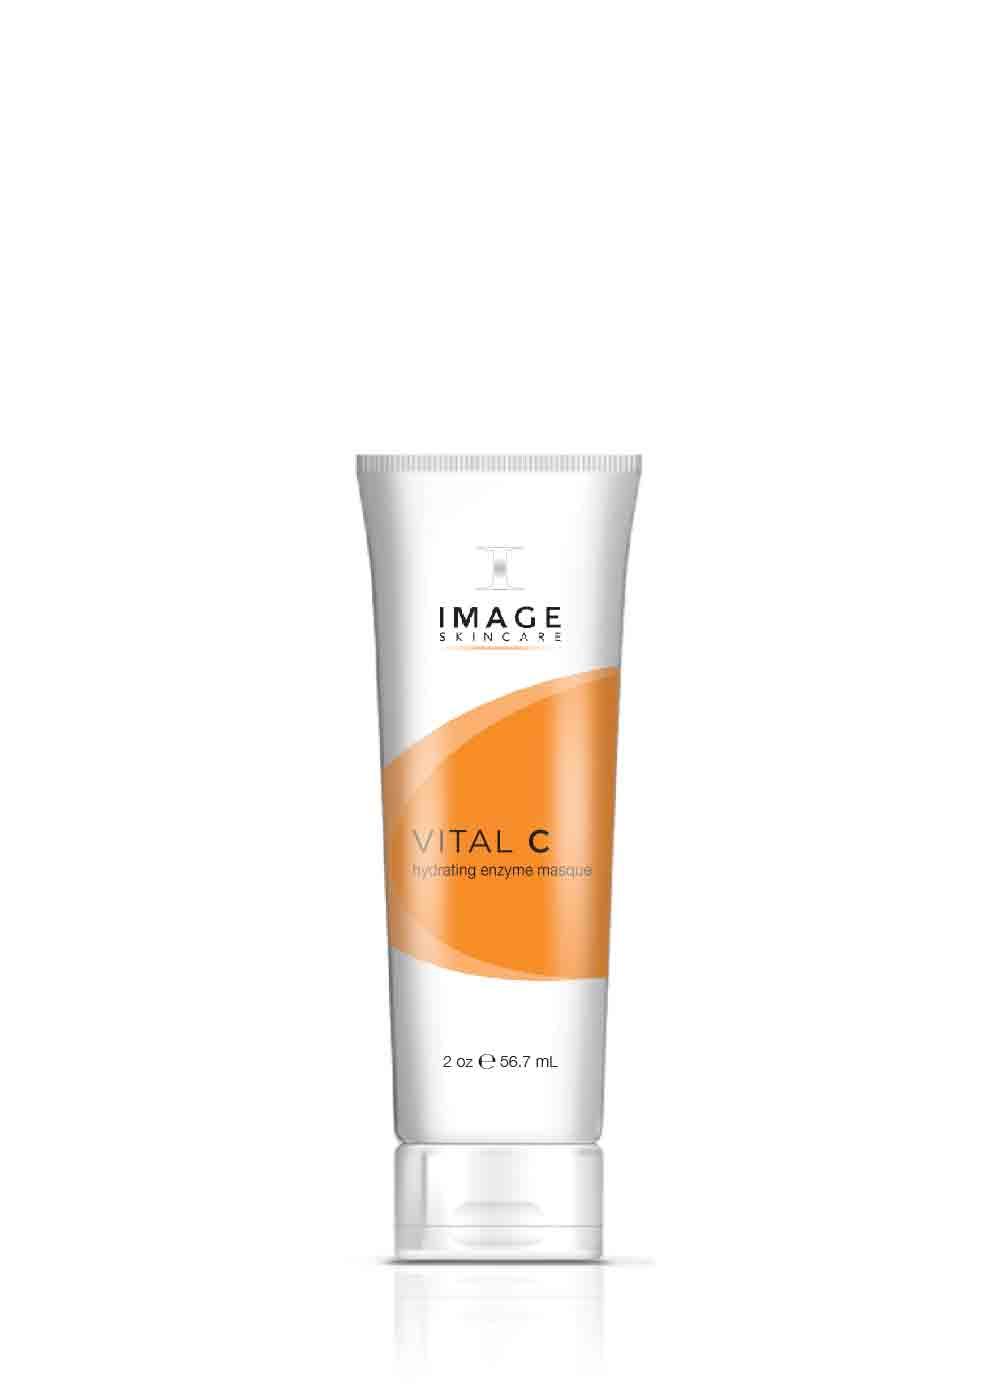 Image-VitalC-Hydrating-Enzyme-Masque.jpg